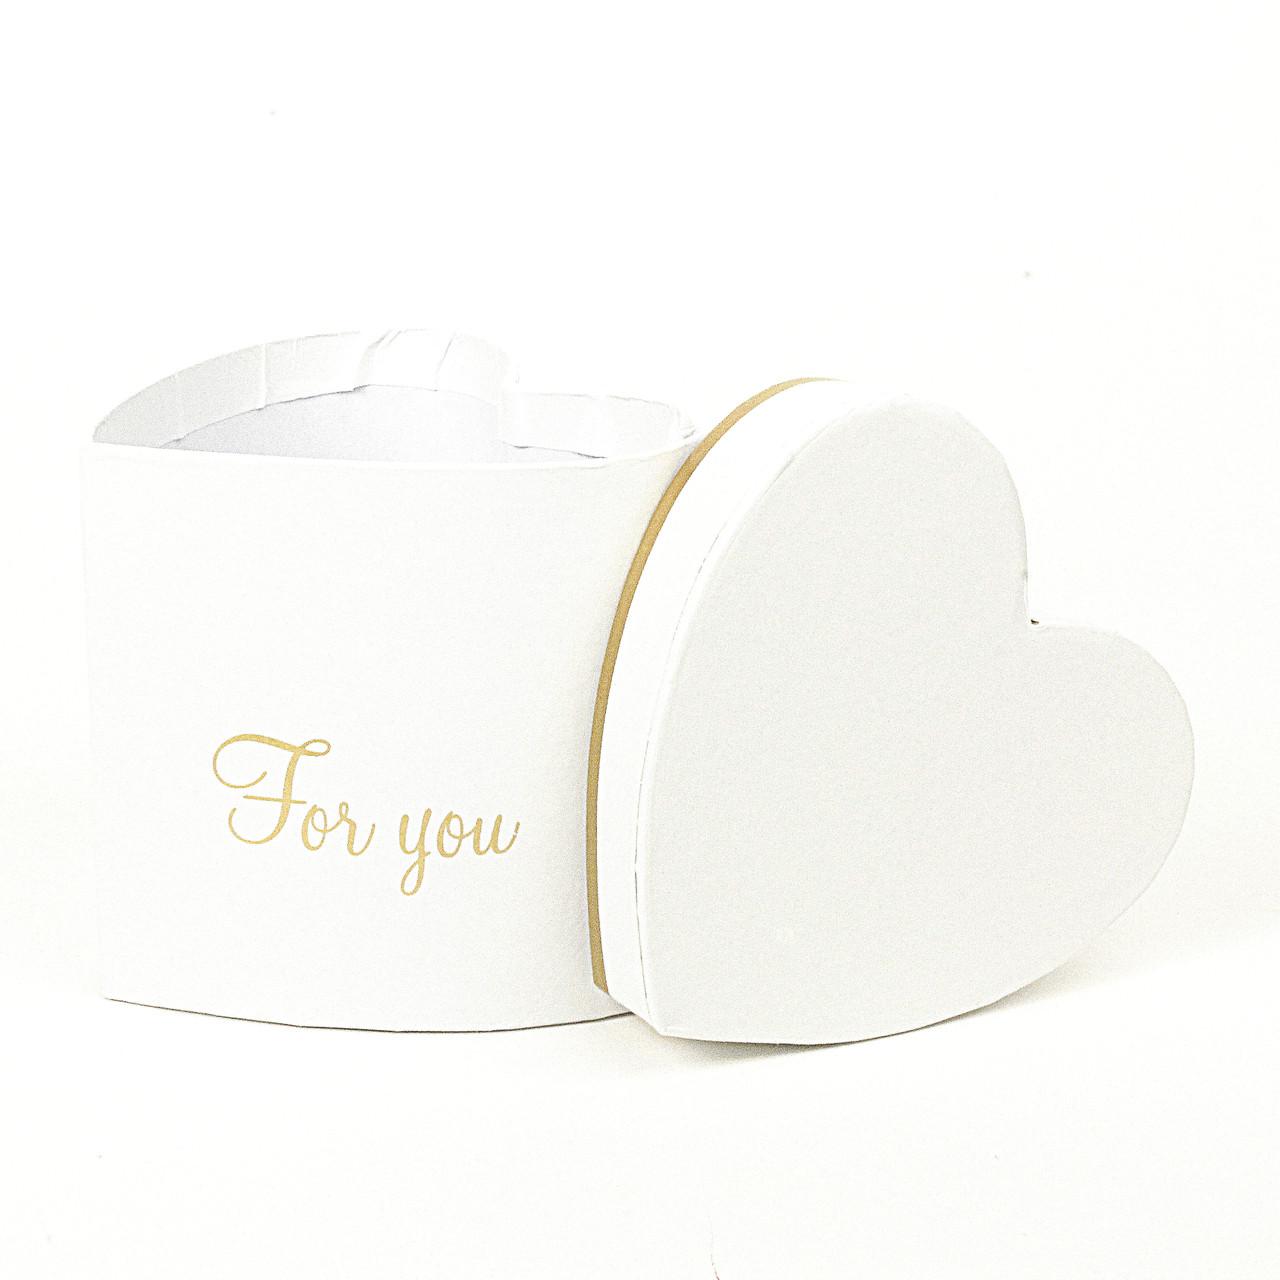 Подарочная коробка в форме сердца белая 9 х 9 х 8 см